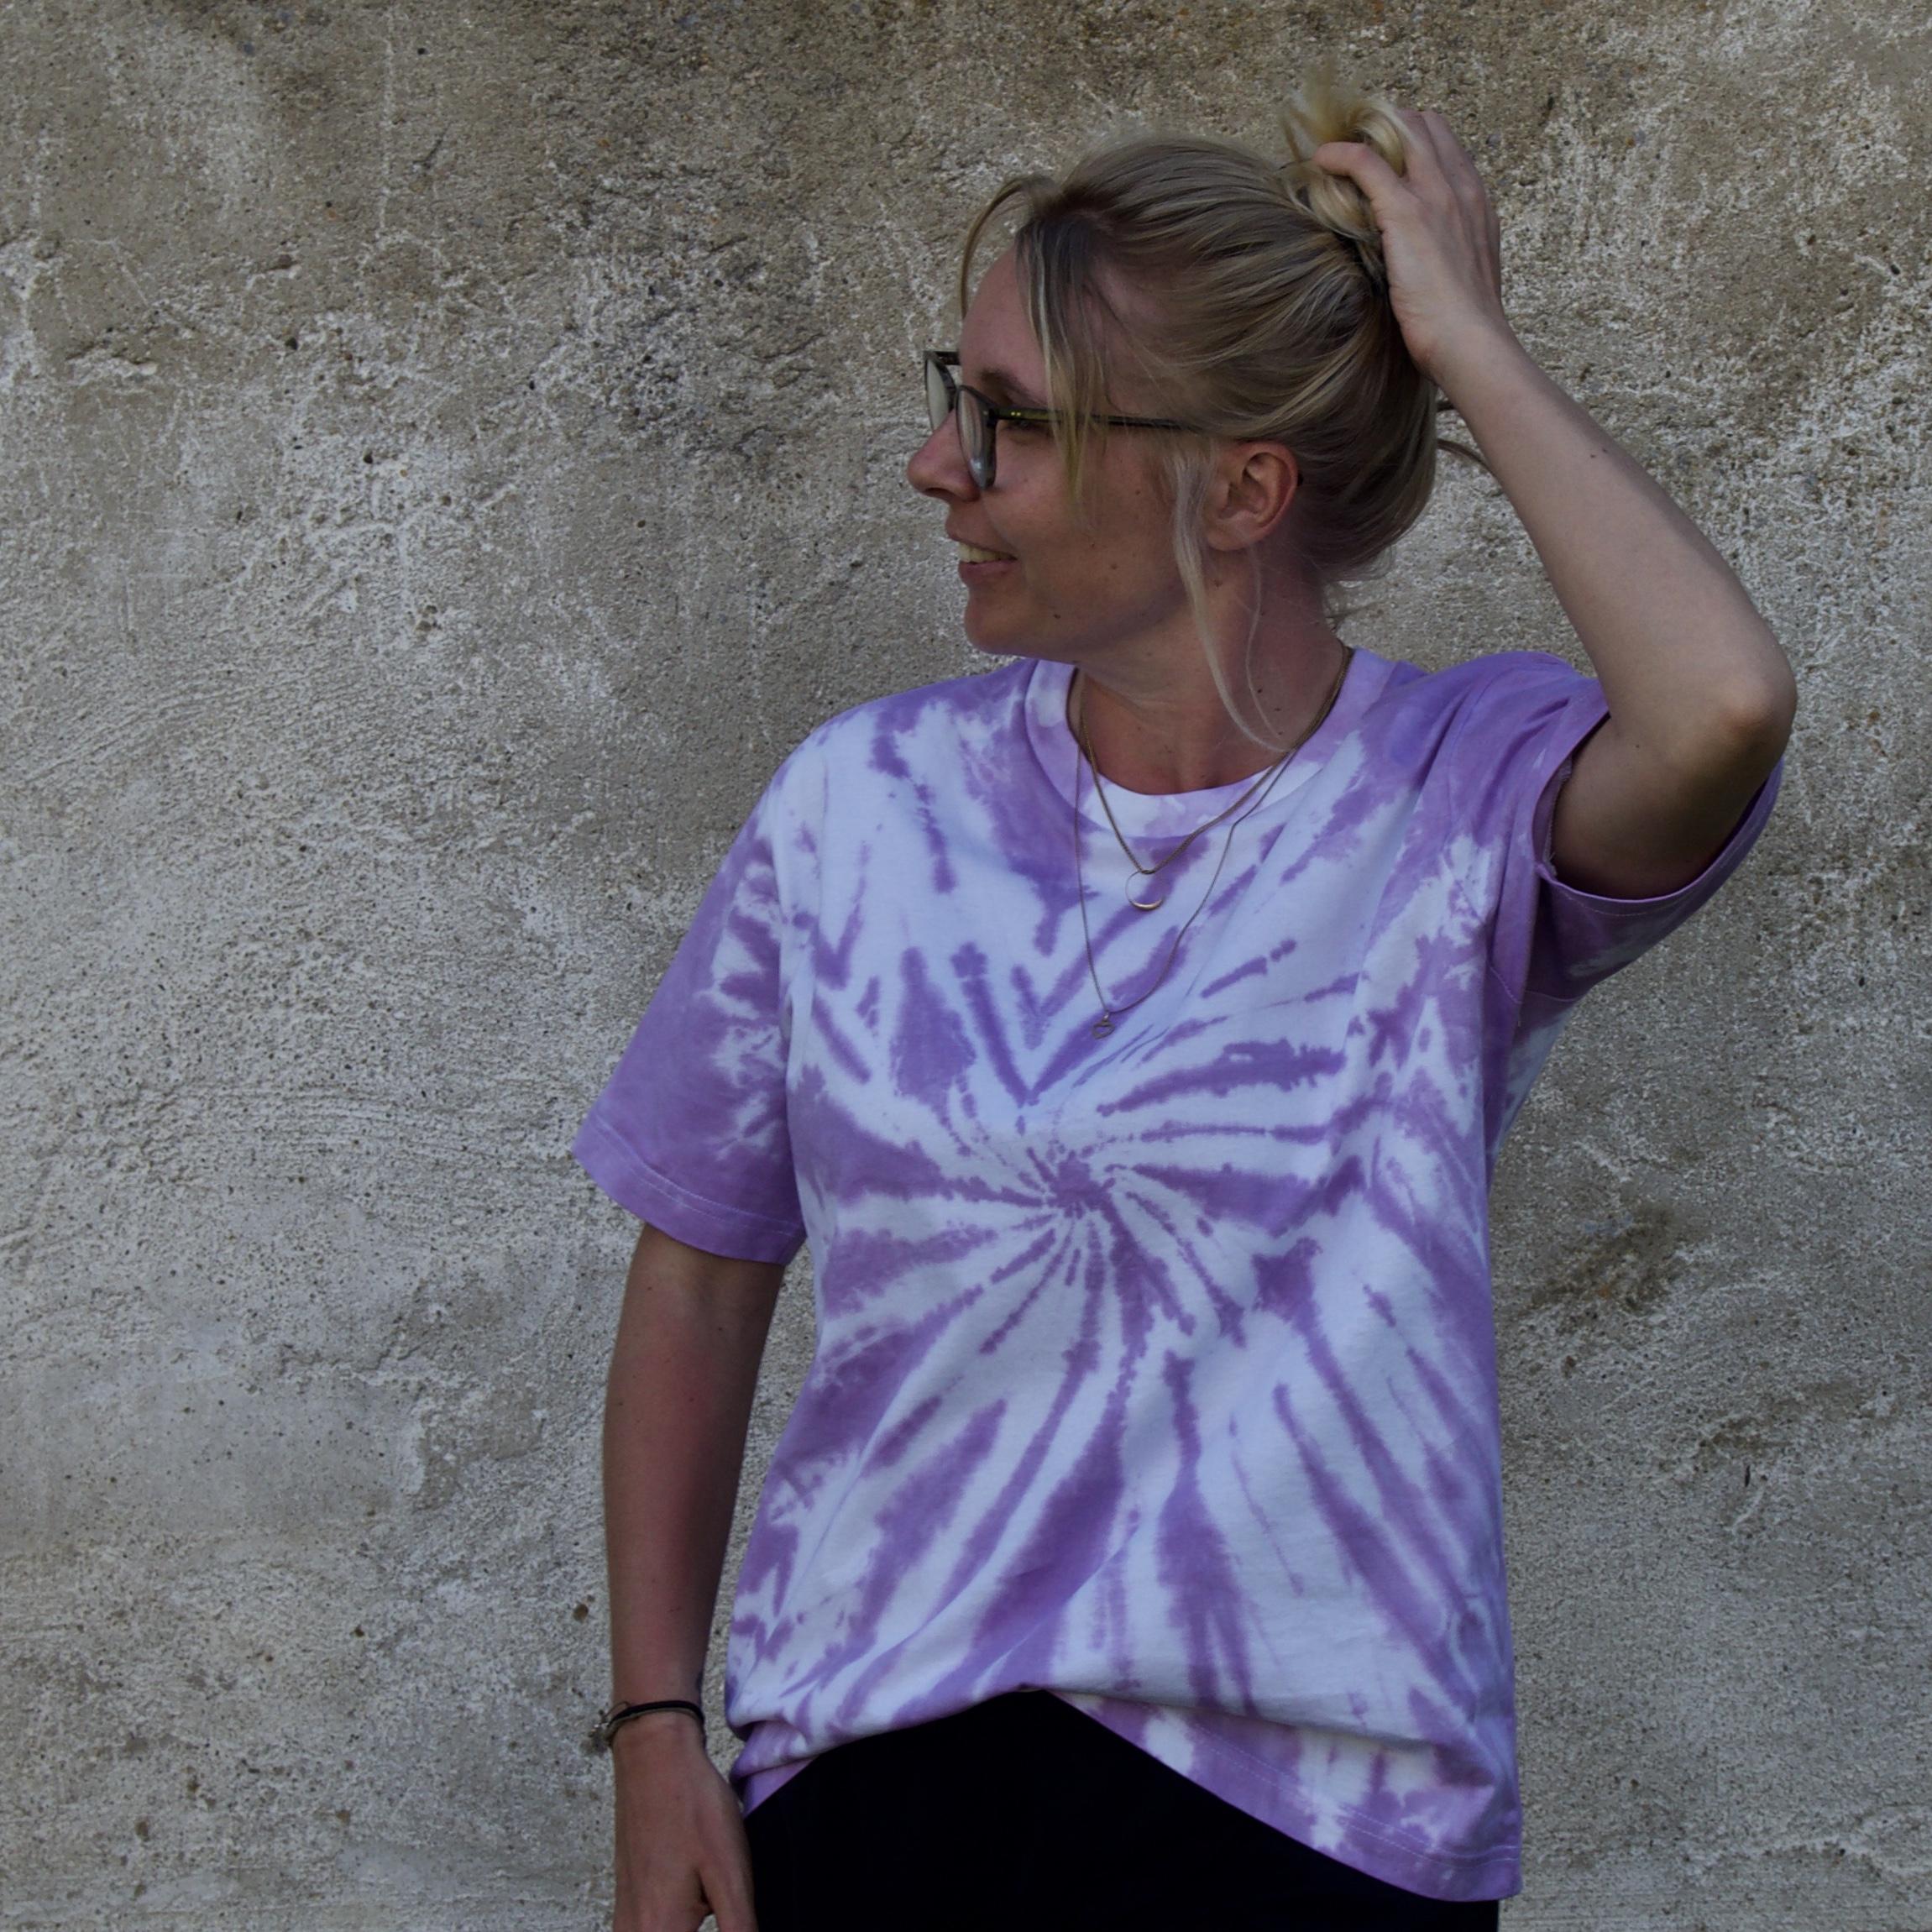 Batik / Tie-Dye Shirt Orchid Glory – Organic, Handmade